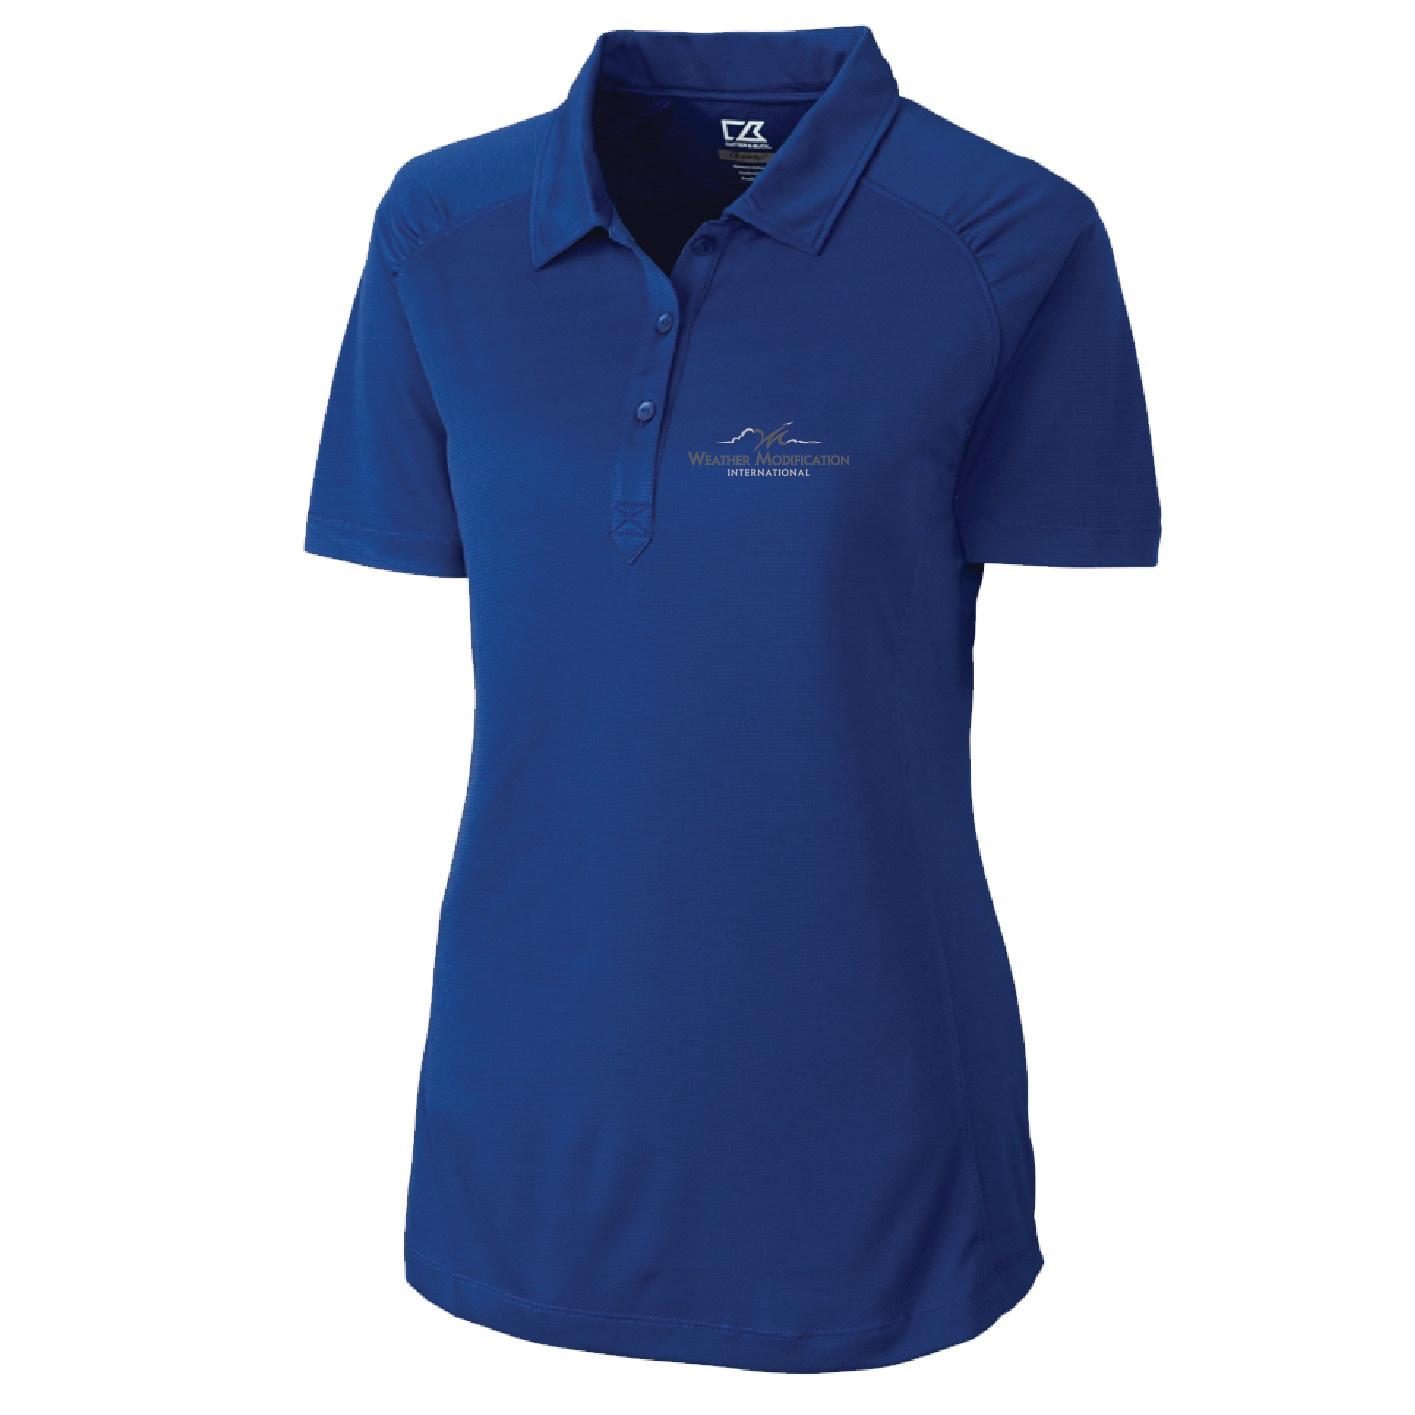 Weatherproof Cutter & Buck Northgate CB DryTec Short Sleeve Womens Polo (Tour Blue)